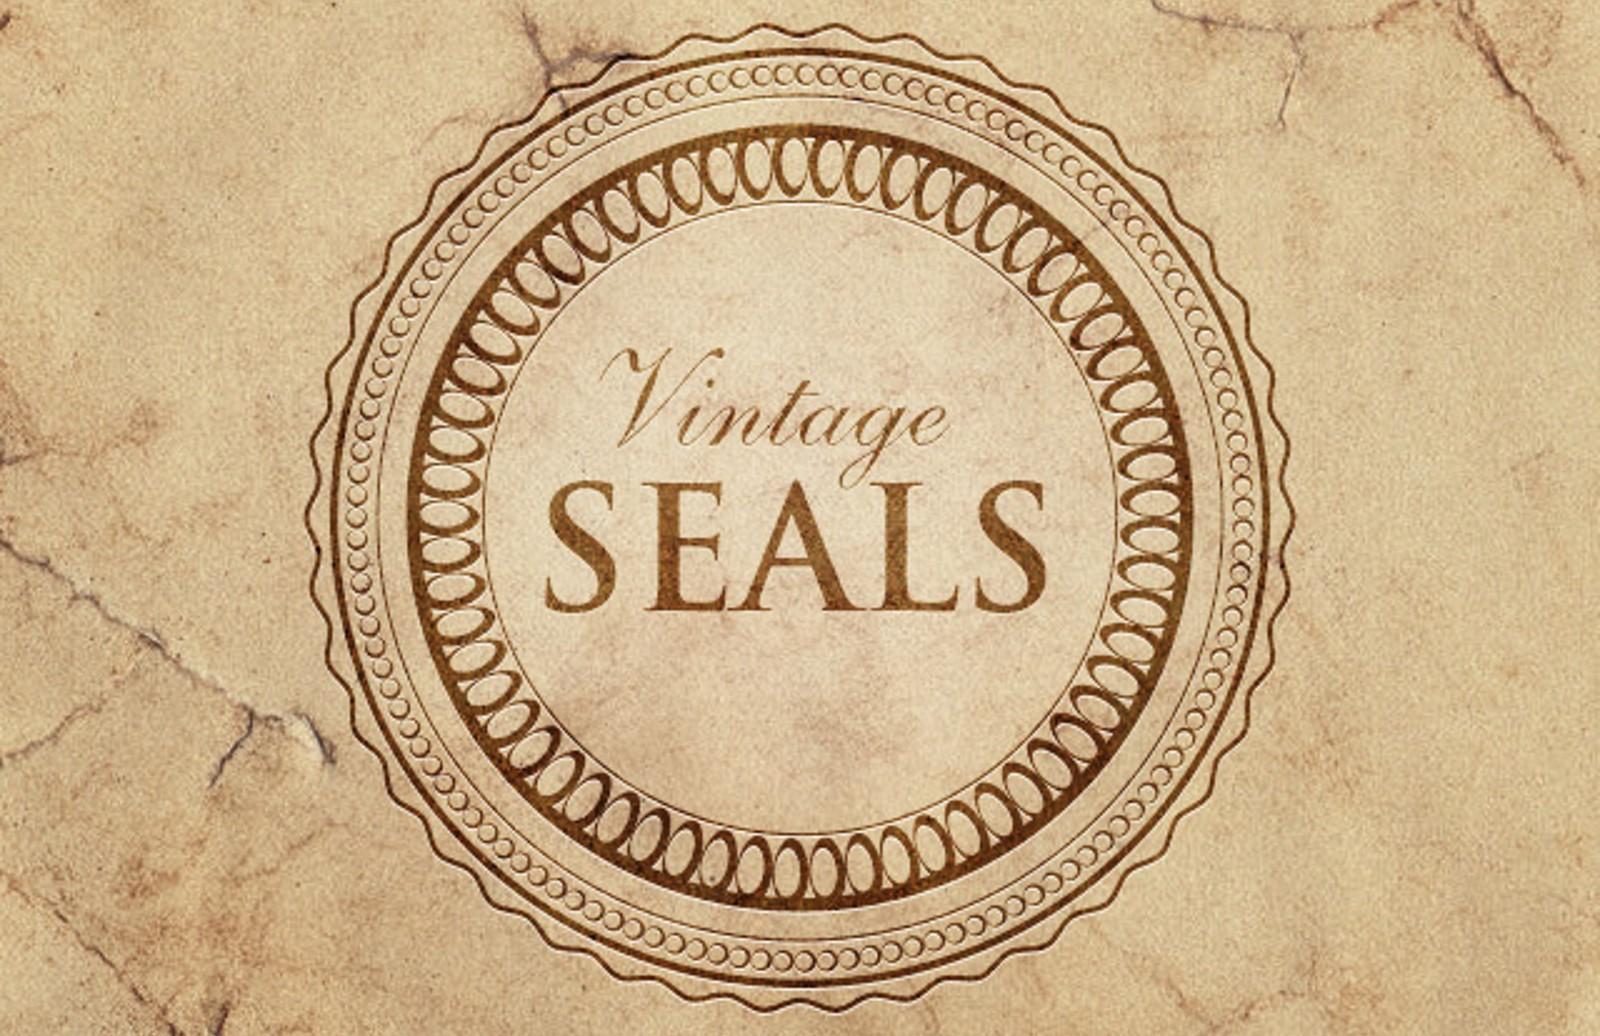 Vintage  Seals  Preview1